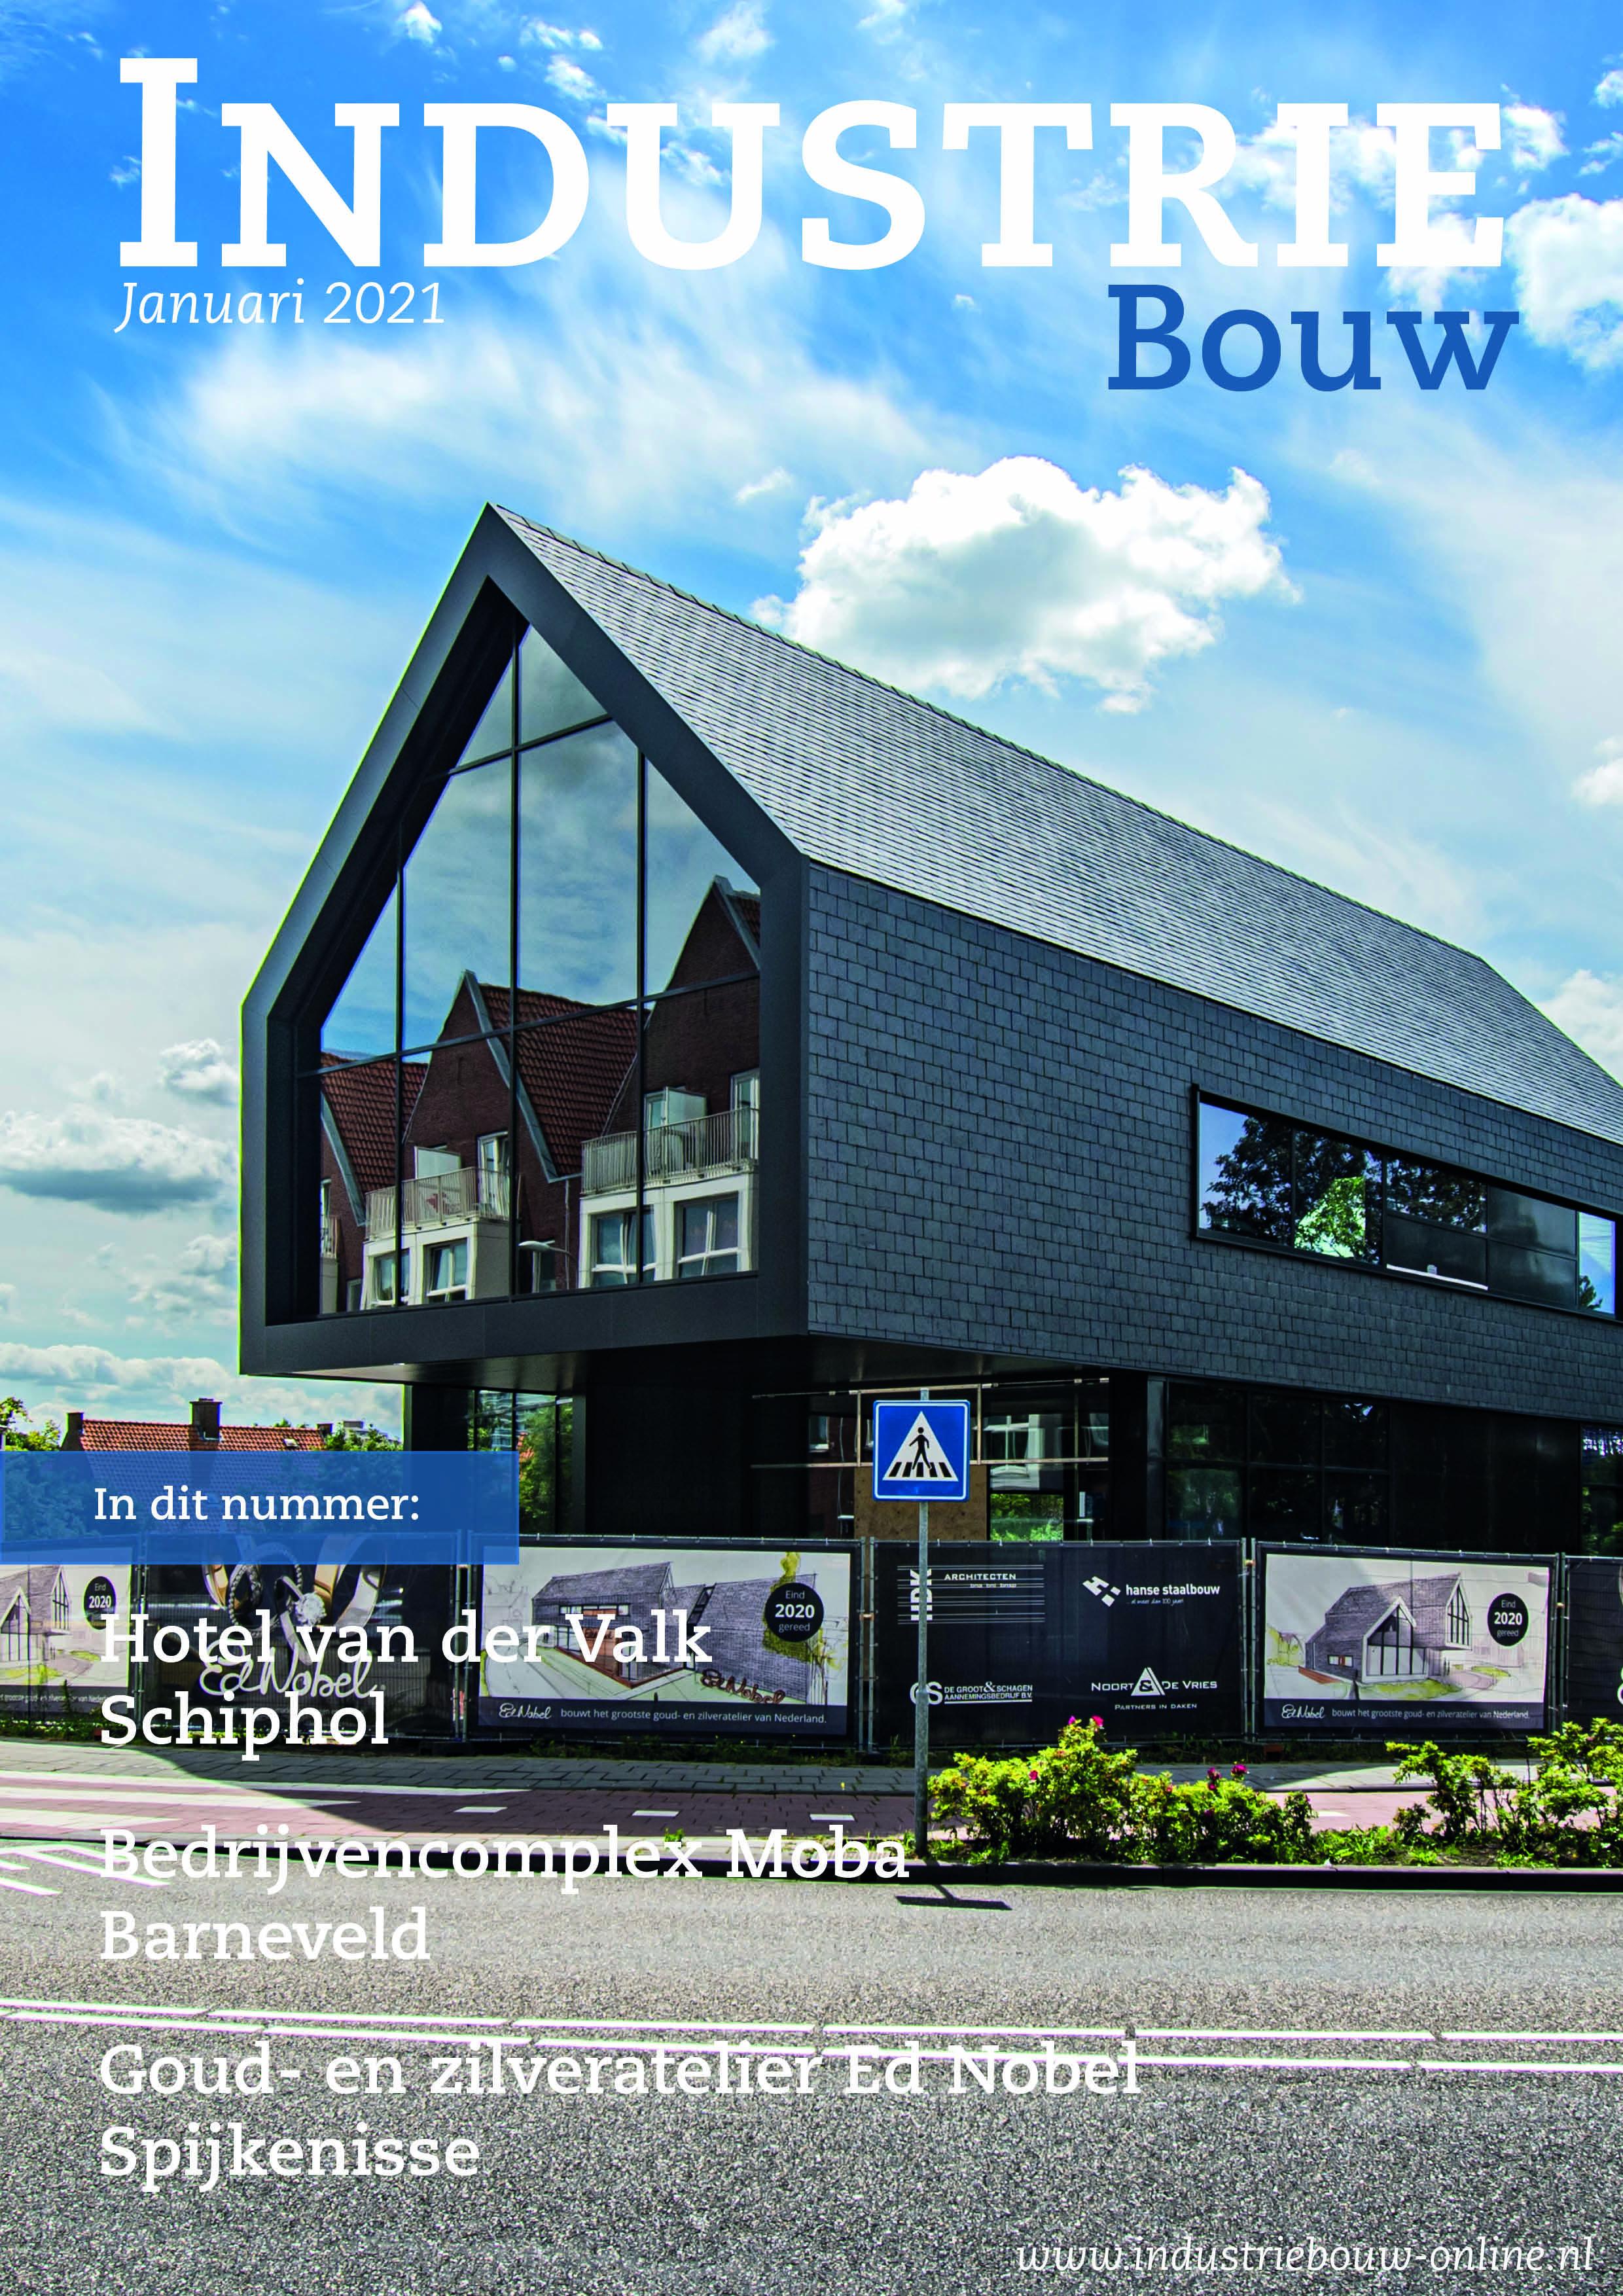 cover Industriebouw, editie 69, januari 2021